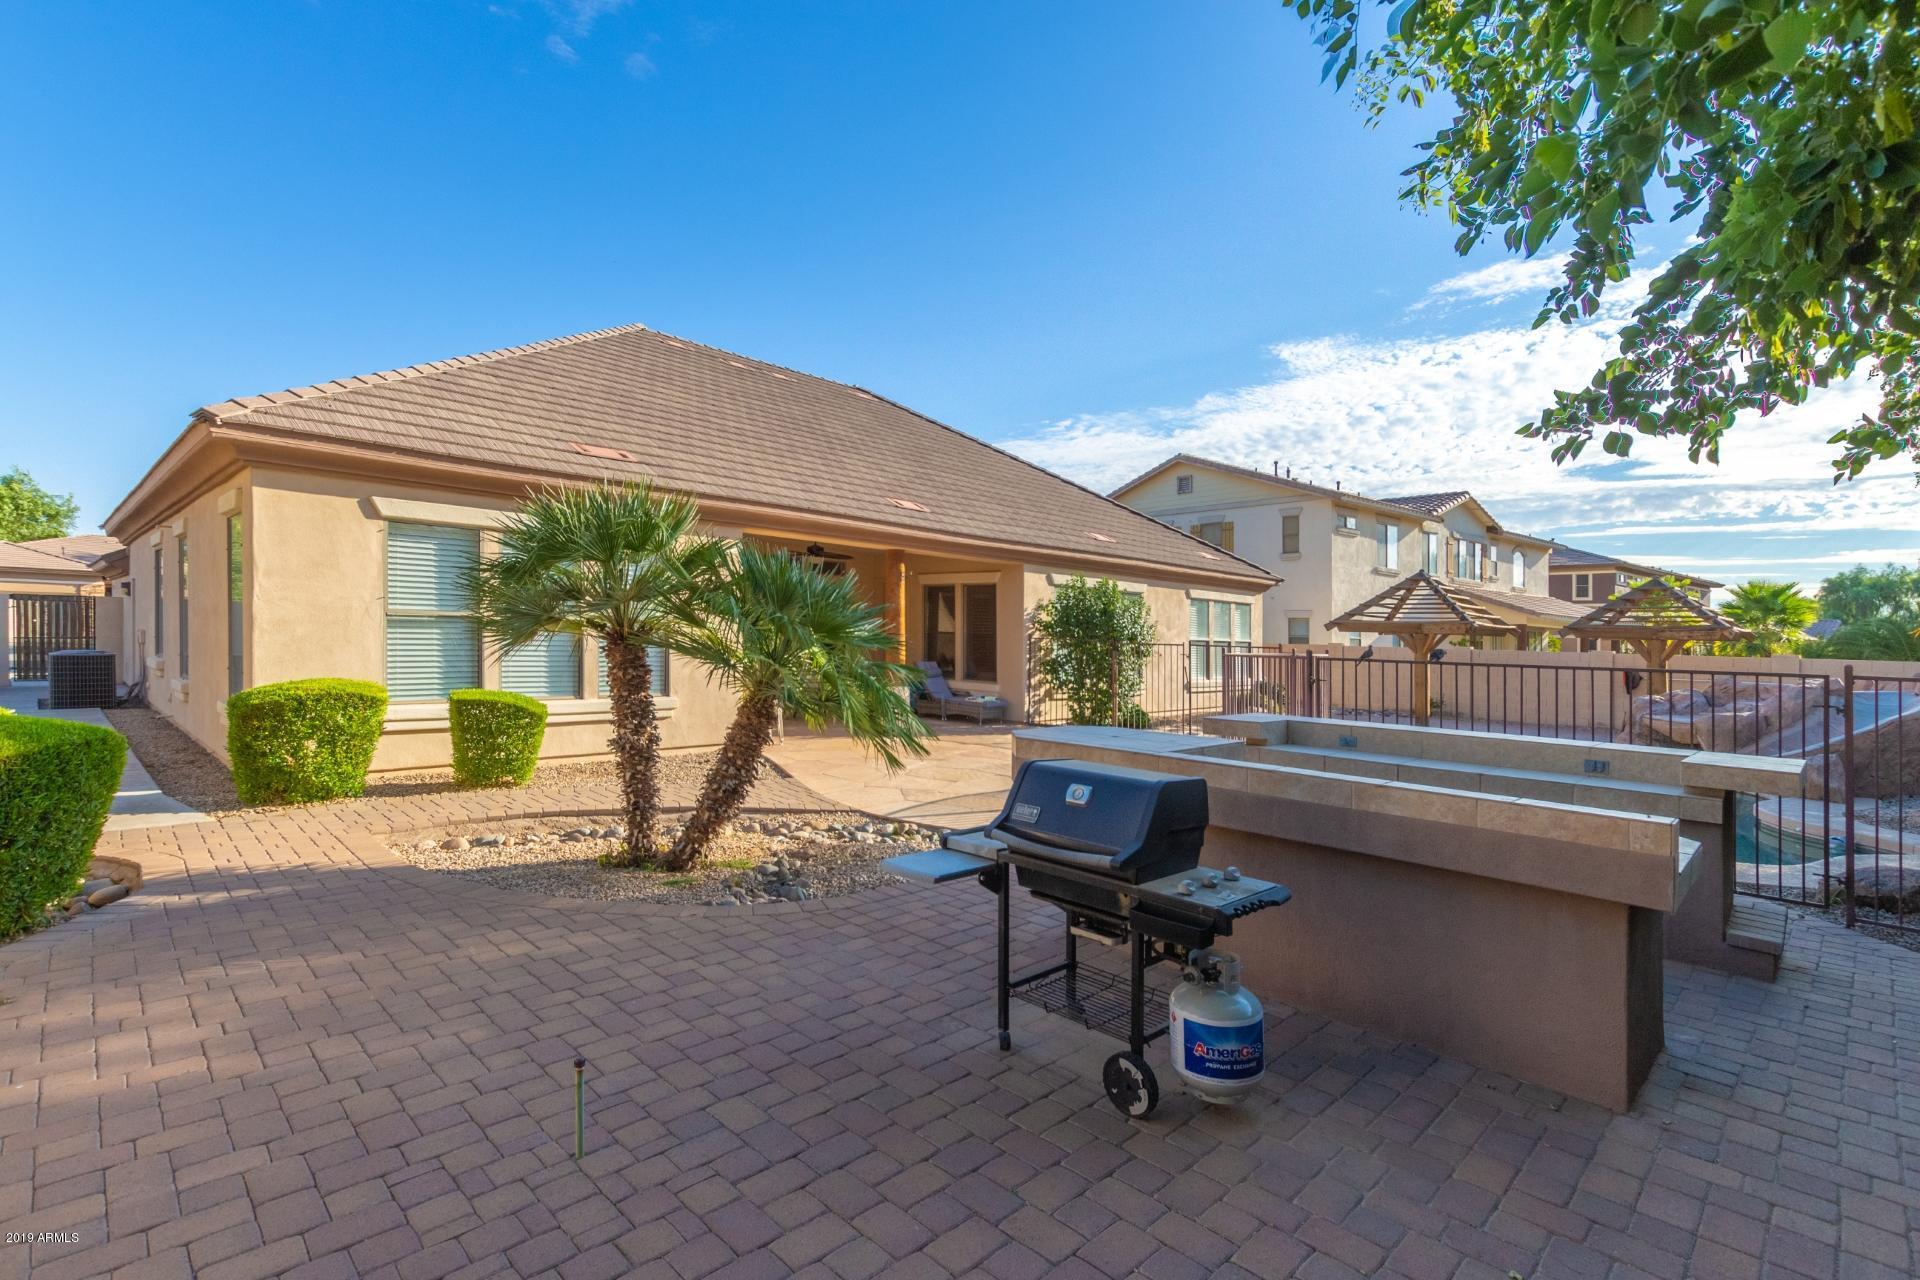 MLS 5956173 18488 E PINE BARRENS Avenue, Queen Creek, AZ 85142 Queen Creek AZ Sossaman Estates